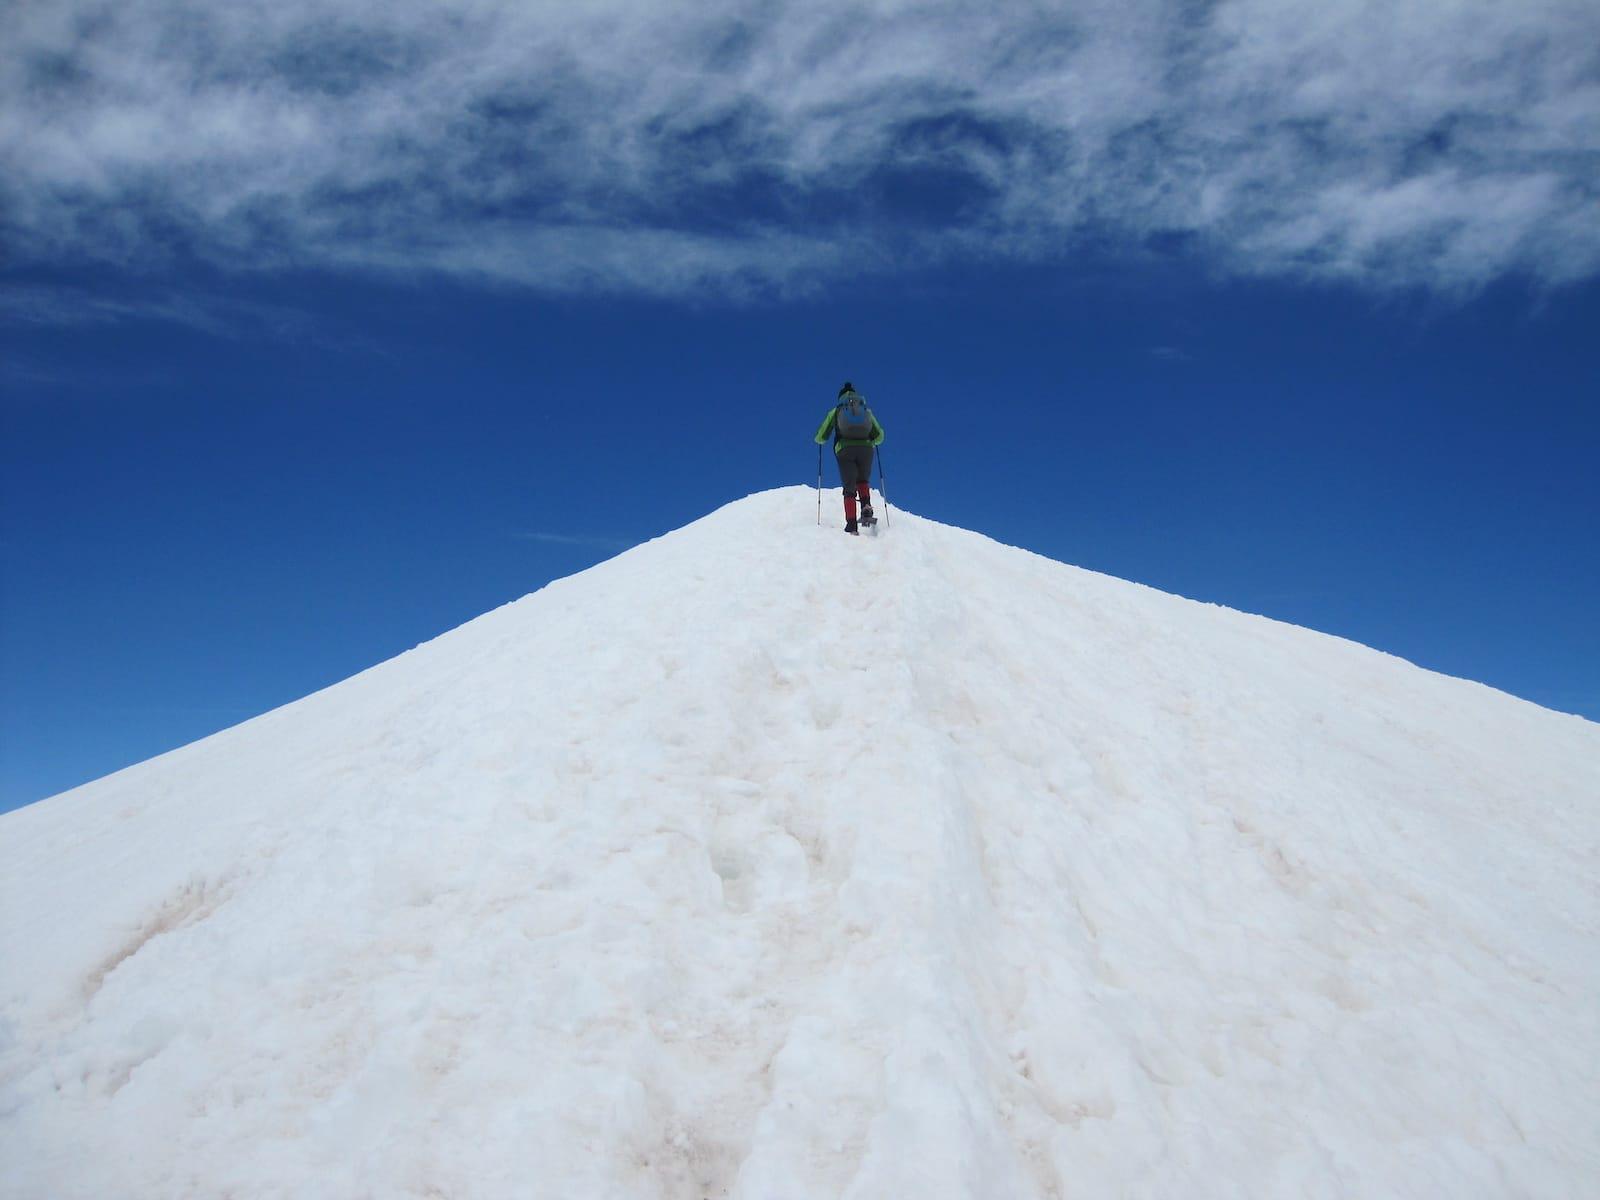 Quandary Peak Hiking Trail Snowshoeing